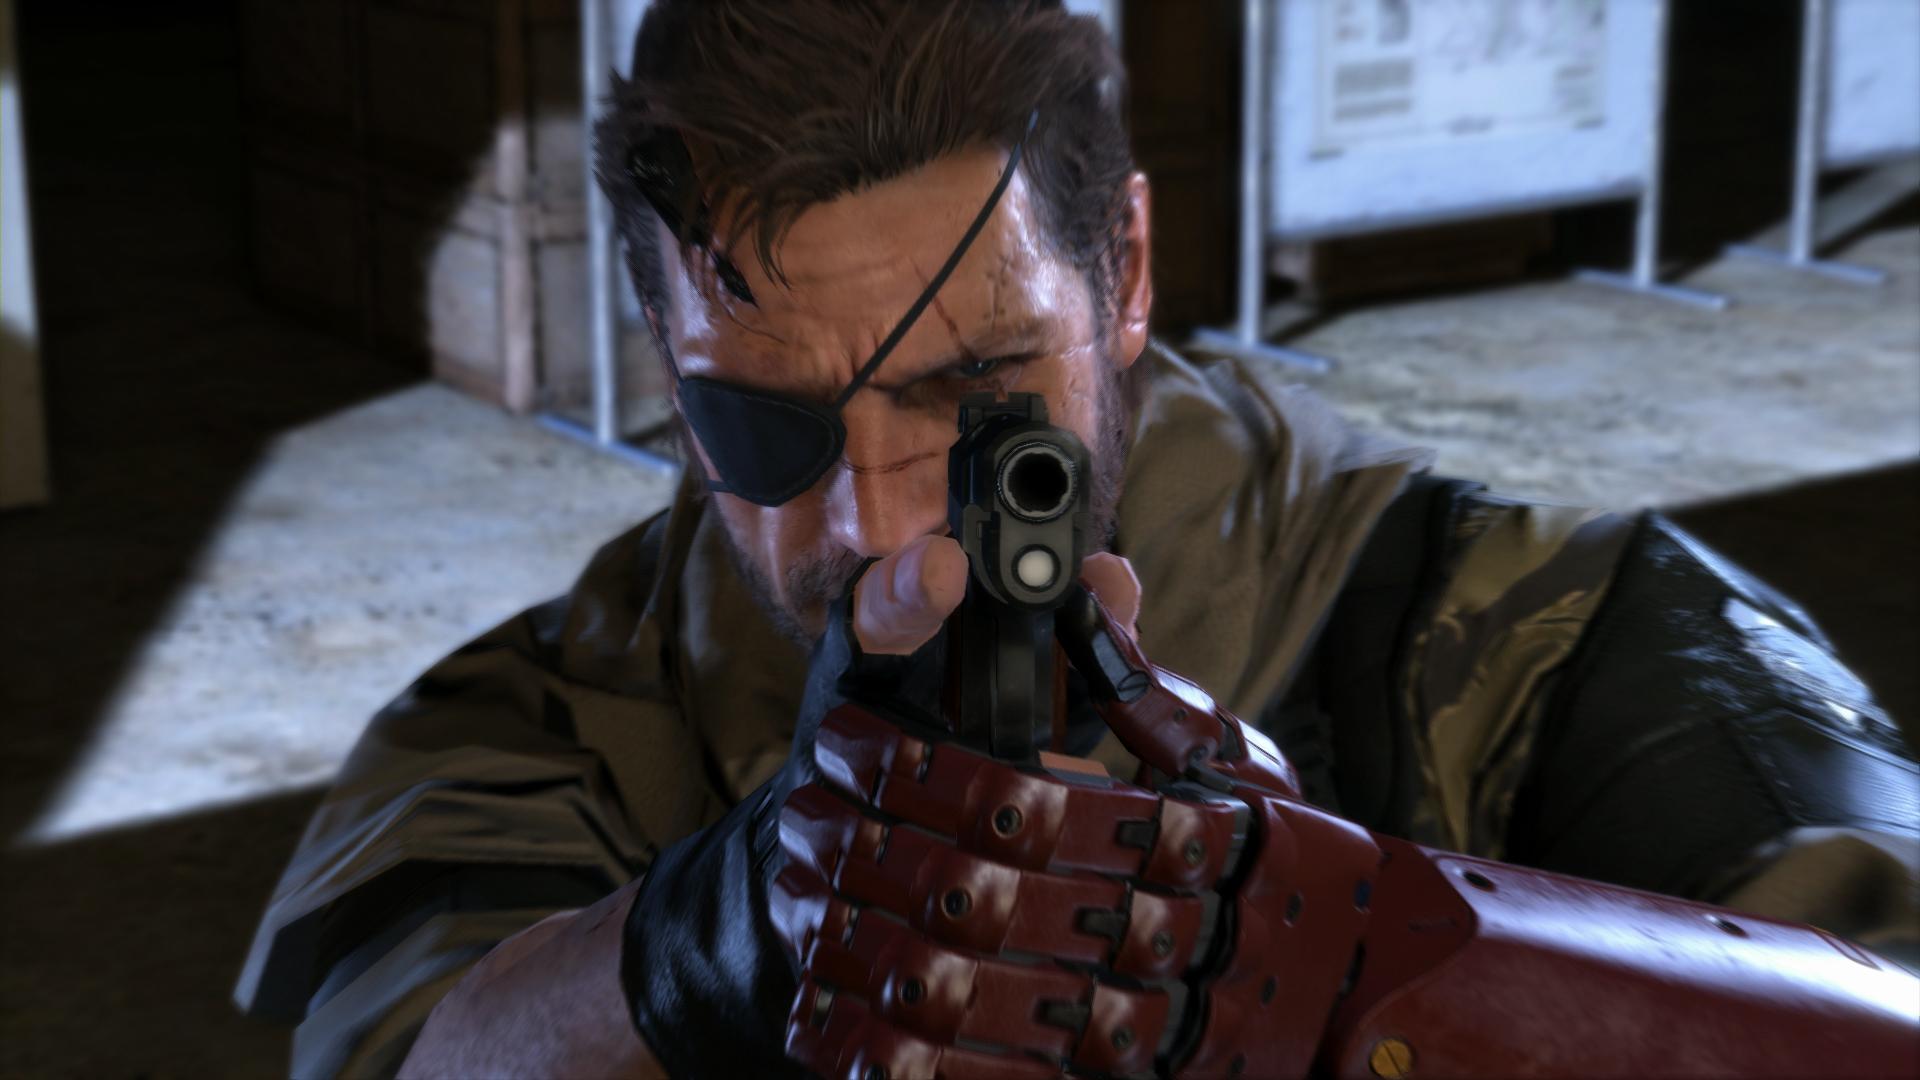 Metal Gear Solid V The Phantom Pain ESPAÑOL Descargar Full (CPY) + REPACK 5 DVD5 (JPW) 10